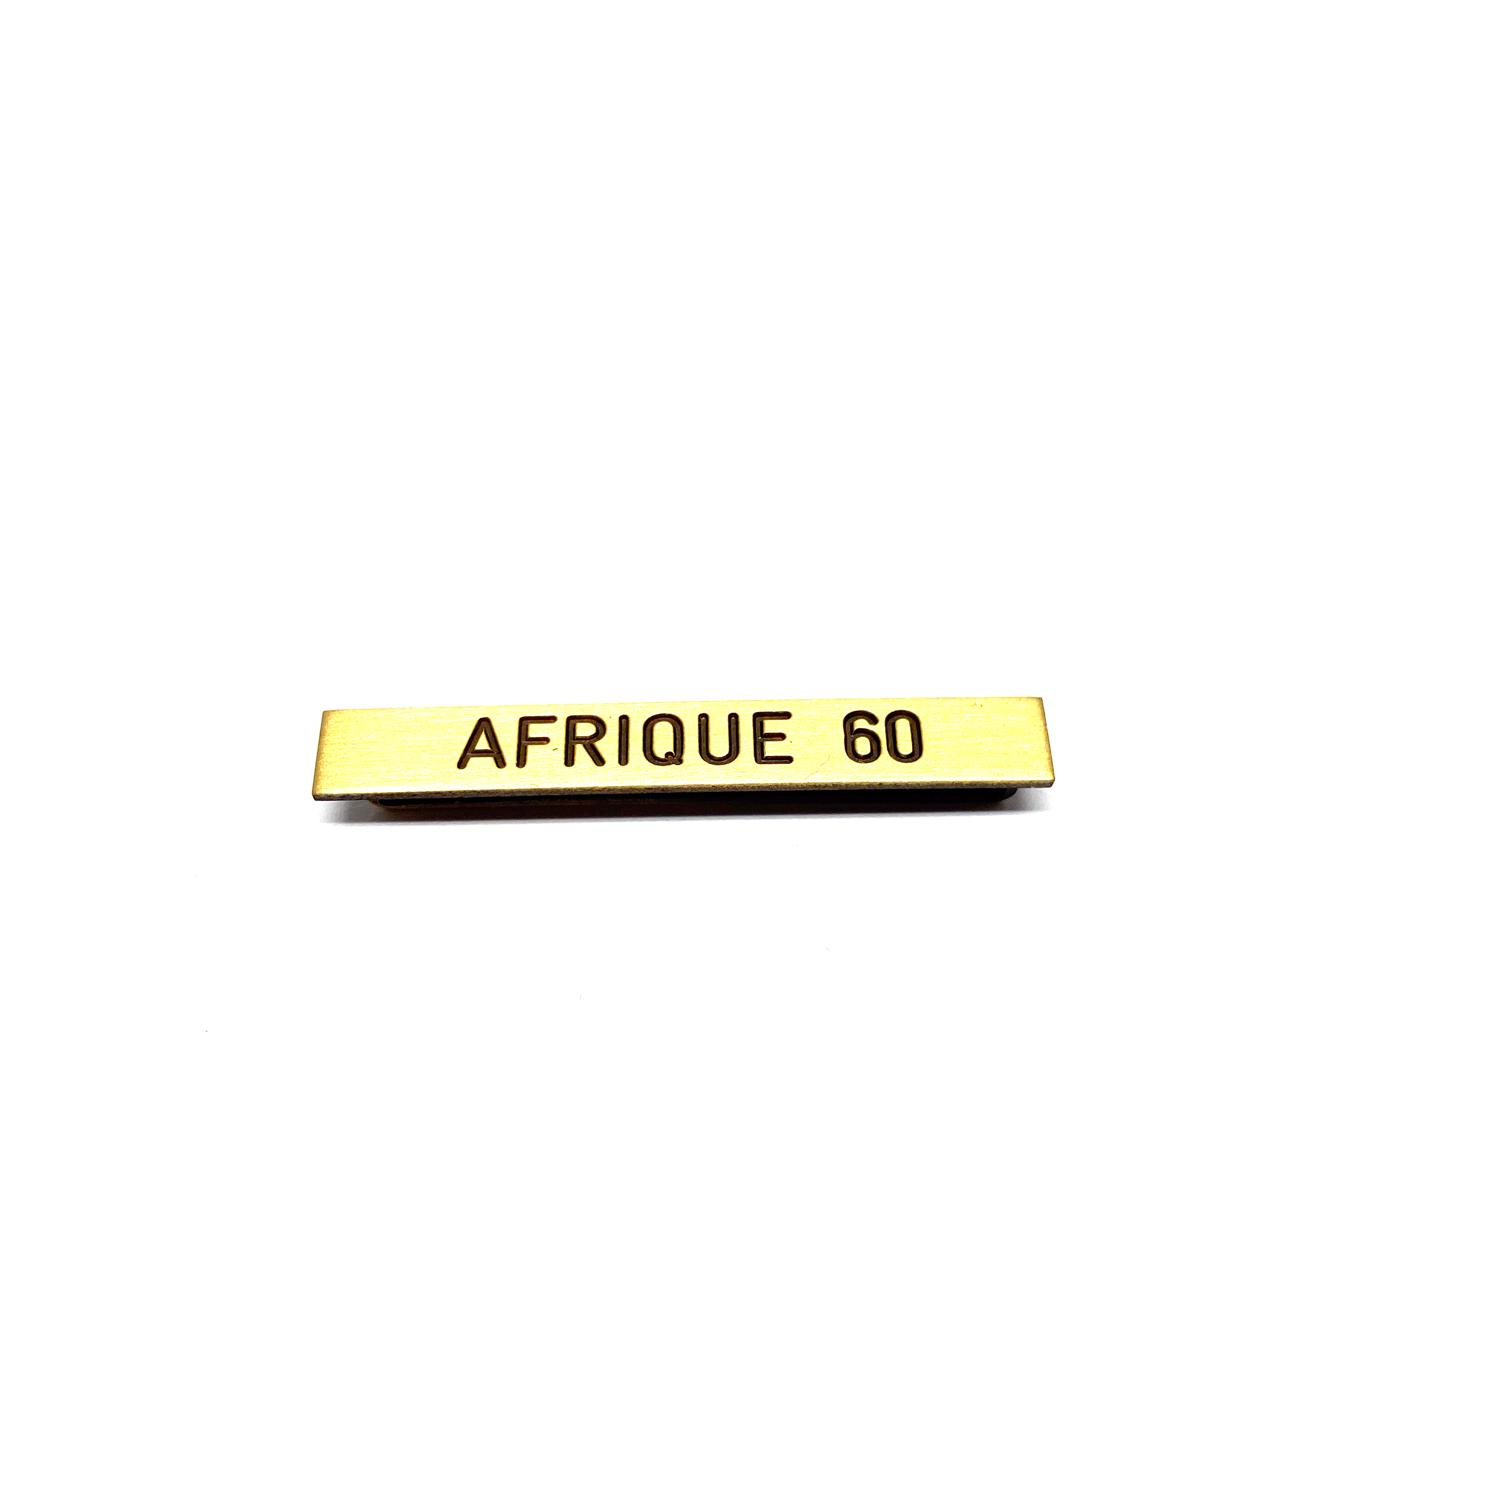 Baret Afrique 60 voor militaire eretekens